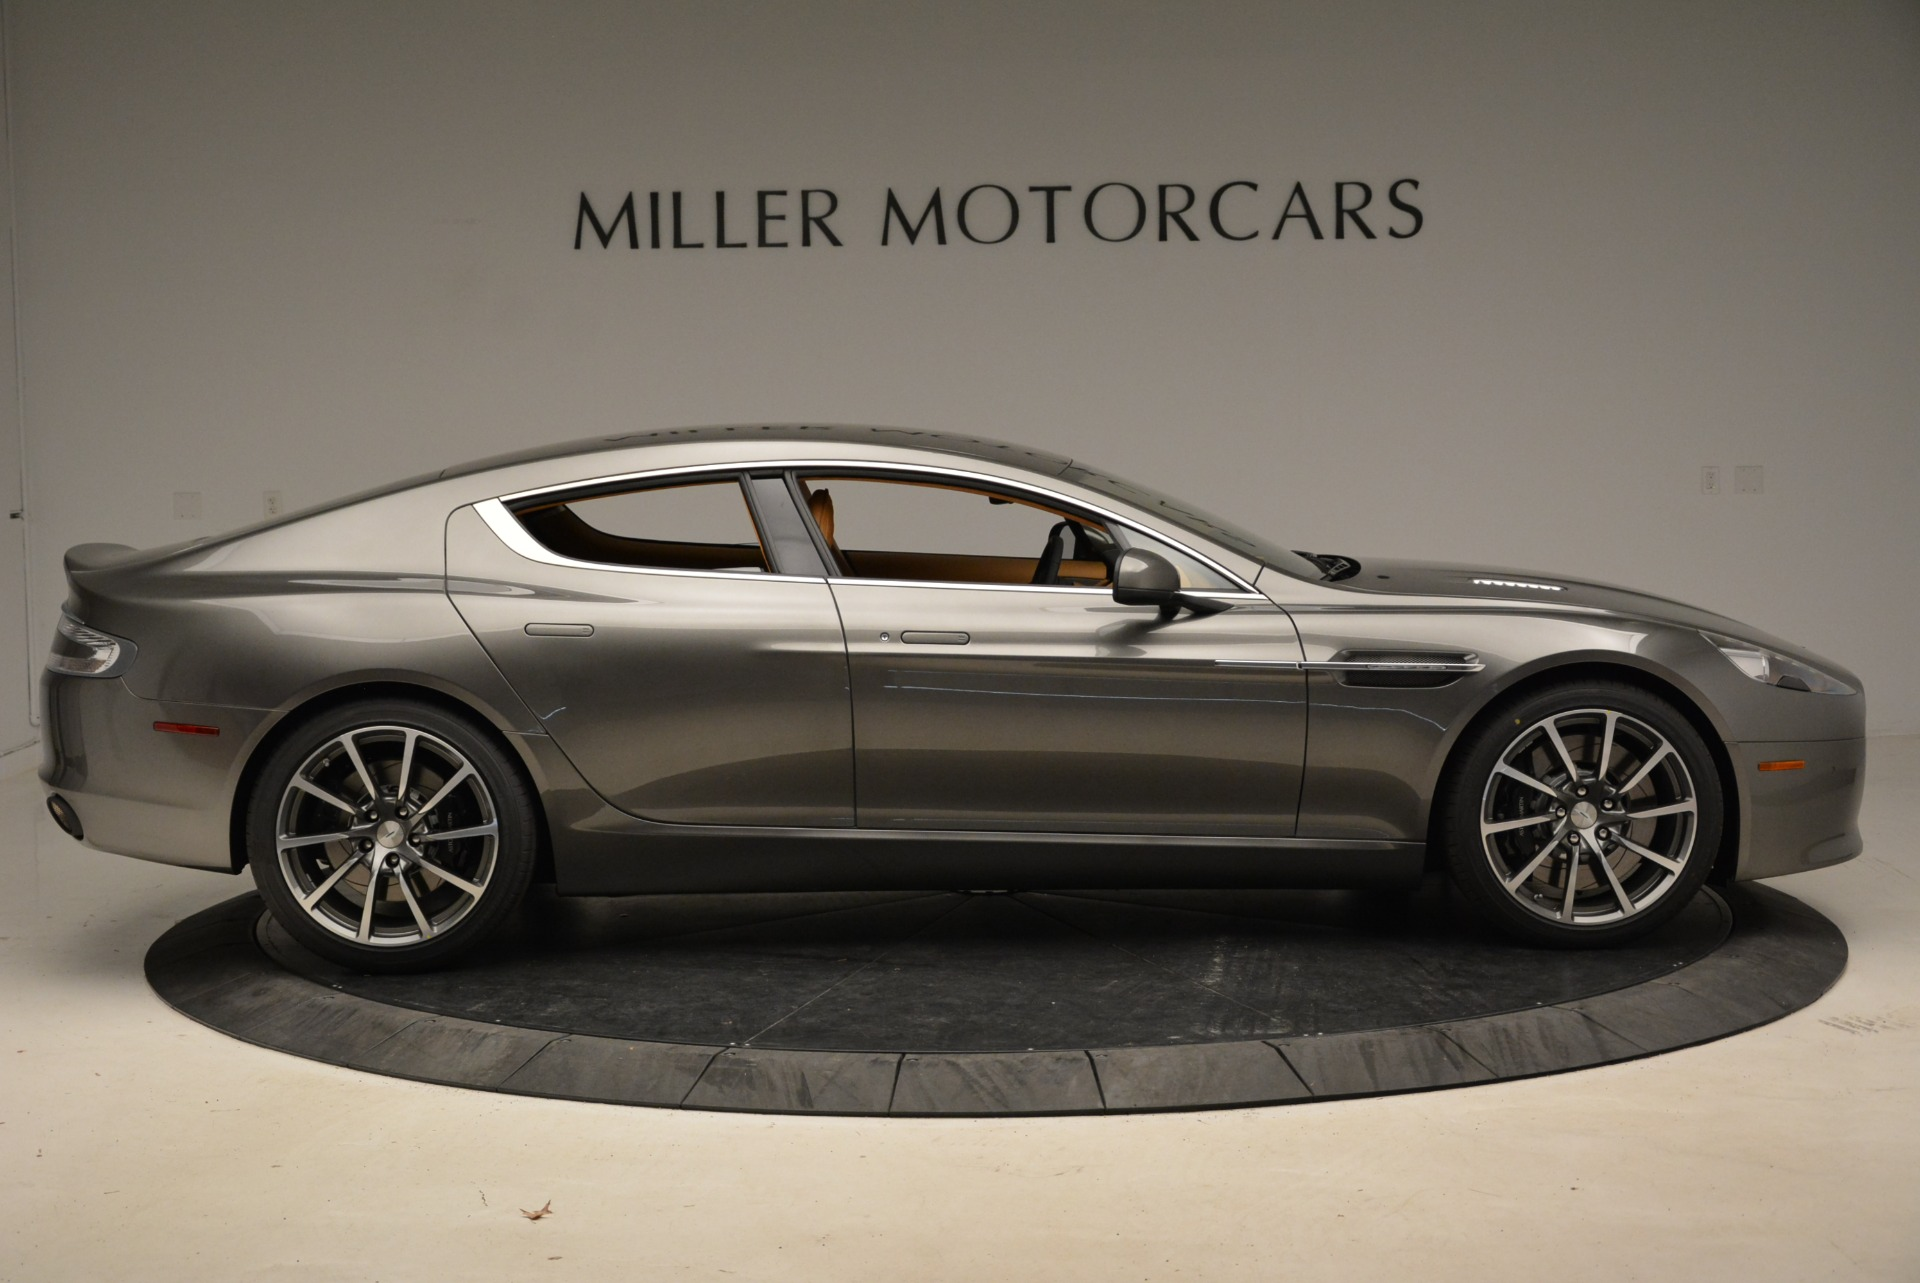 Used 2017 Aston Martin Rapide S Sedan For Sale 210676 In Greenwich, CT